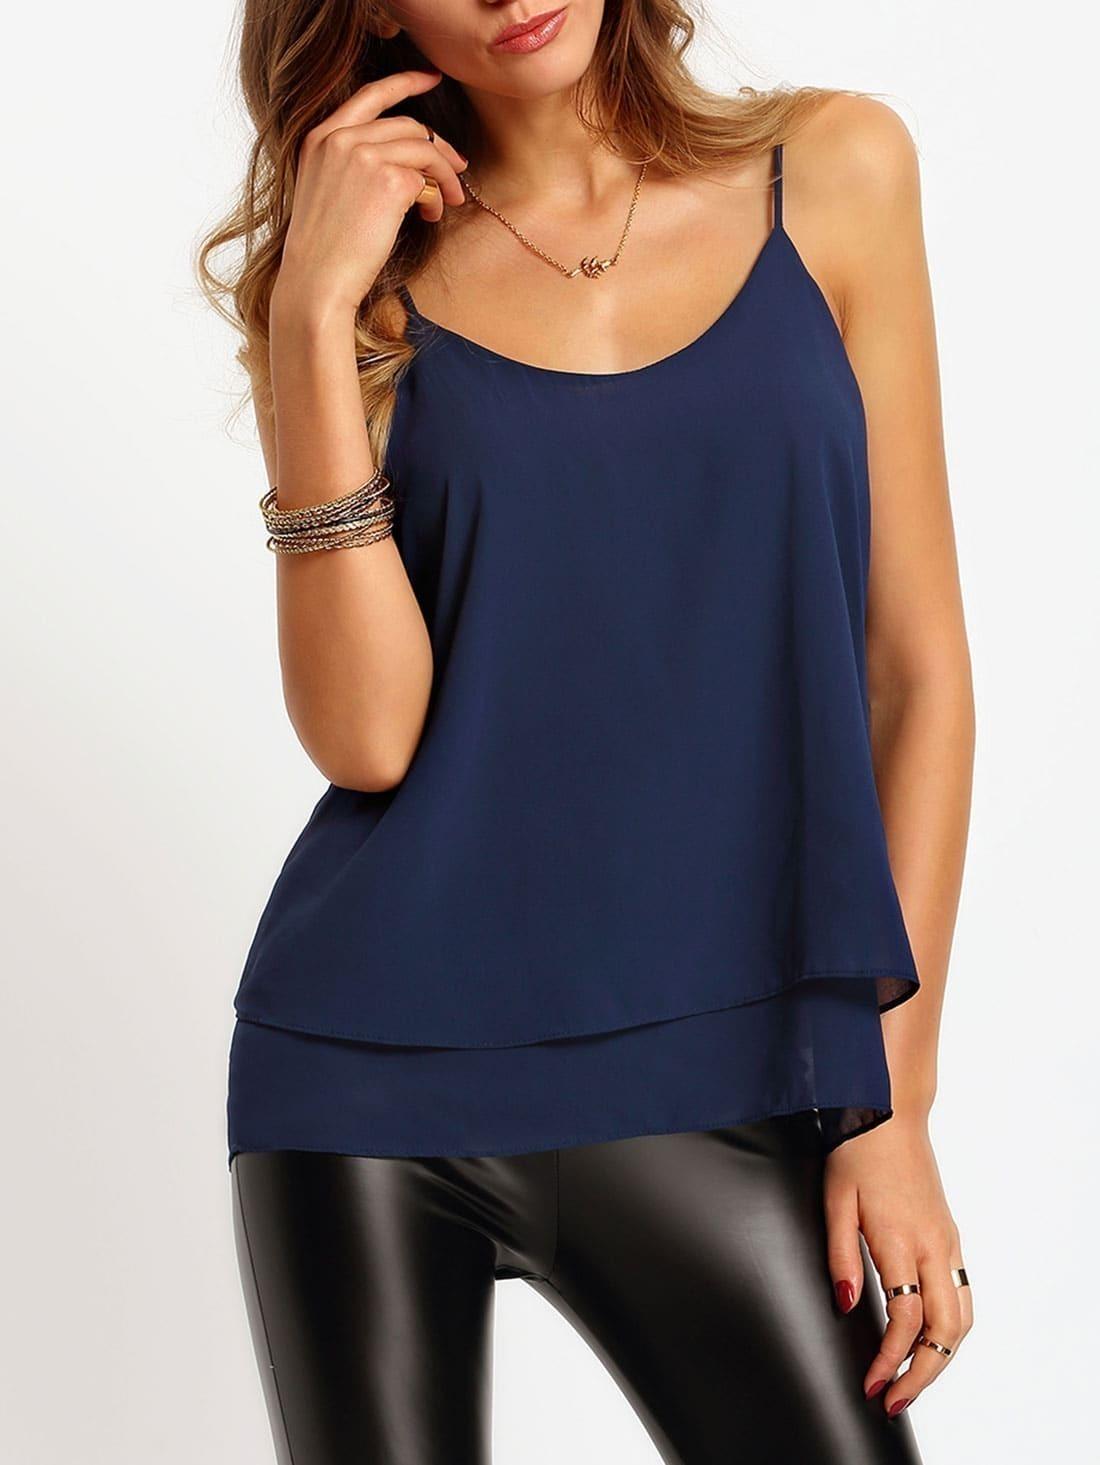 599c9a8169986 Navy Spaghetti Strap Chiffon Cami Top EmmaCloth-Women Fast Fashion ...